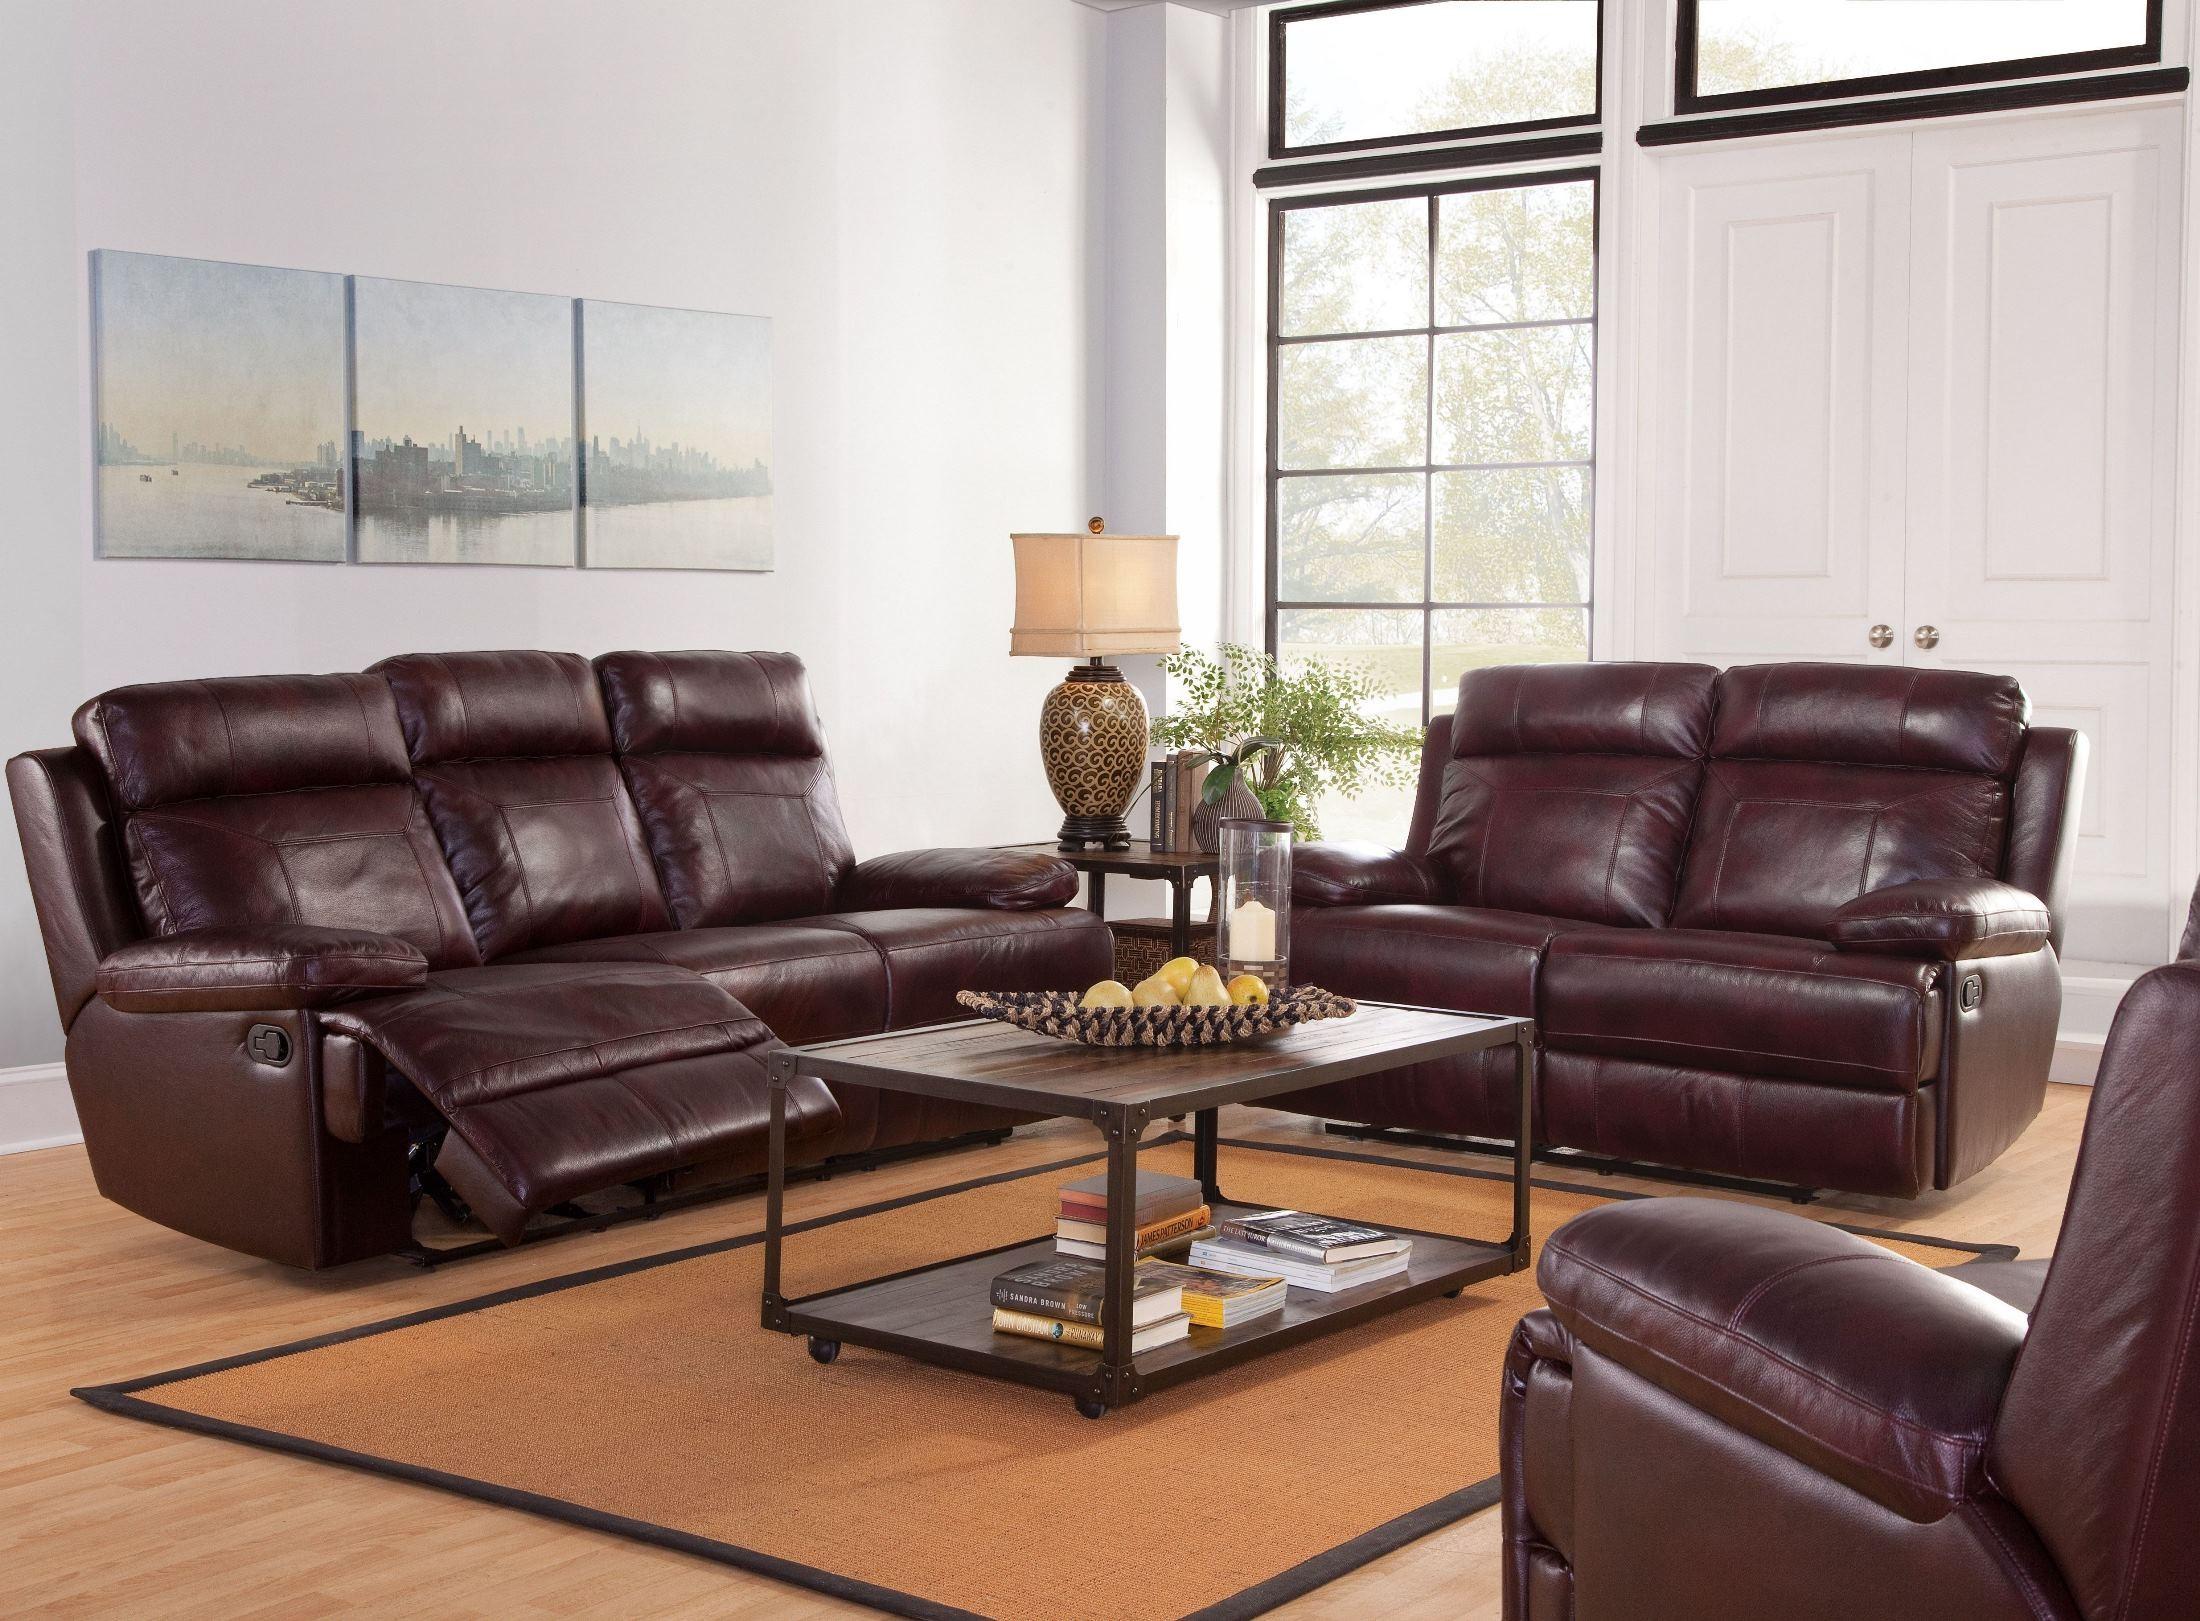 Mansfield burgundy power reclining living room set l6807 for Burgundy living room set